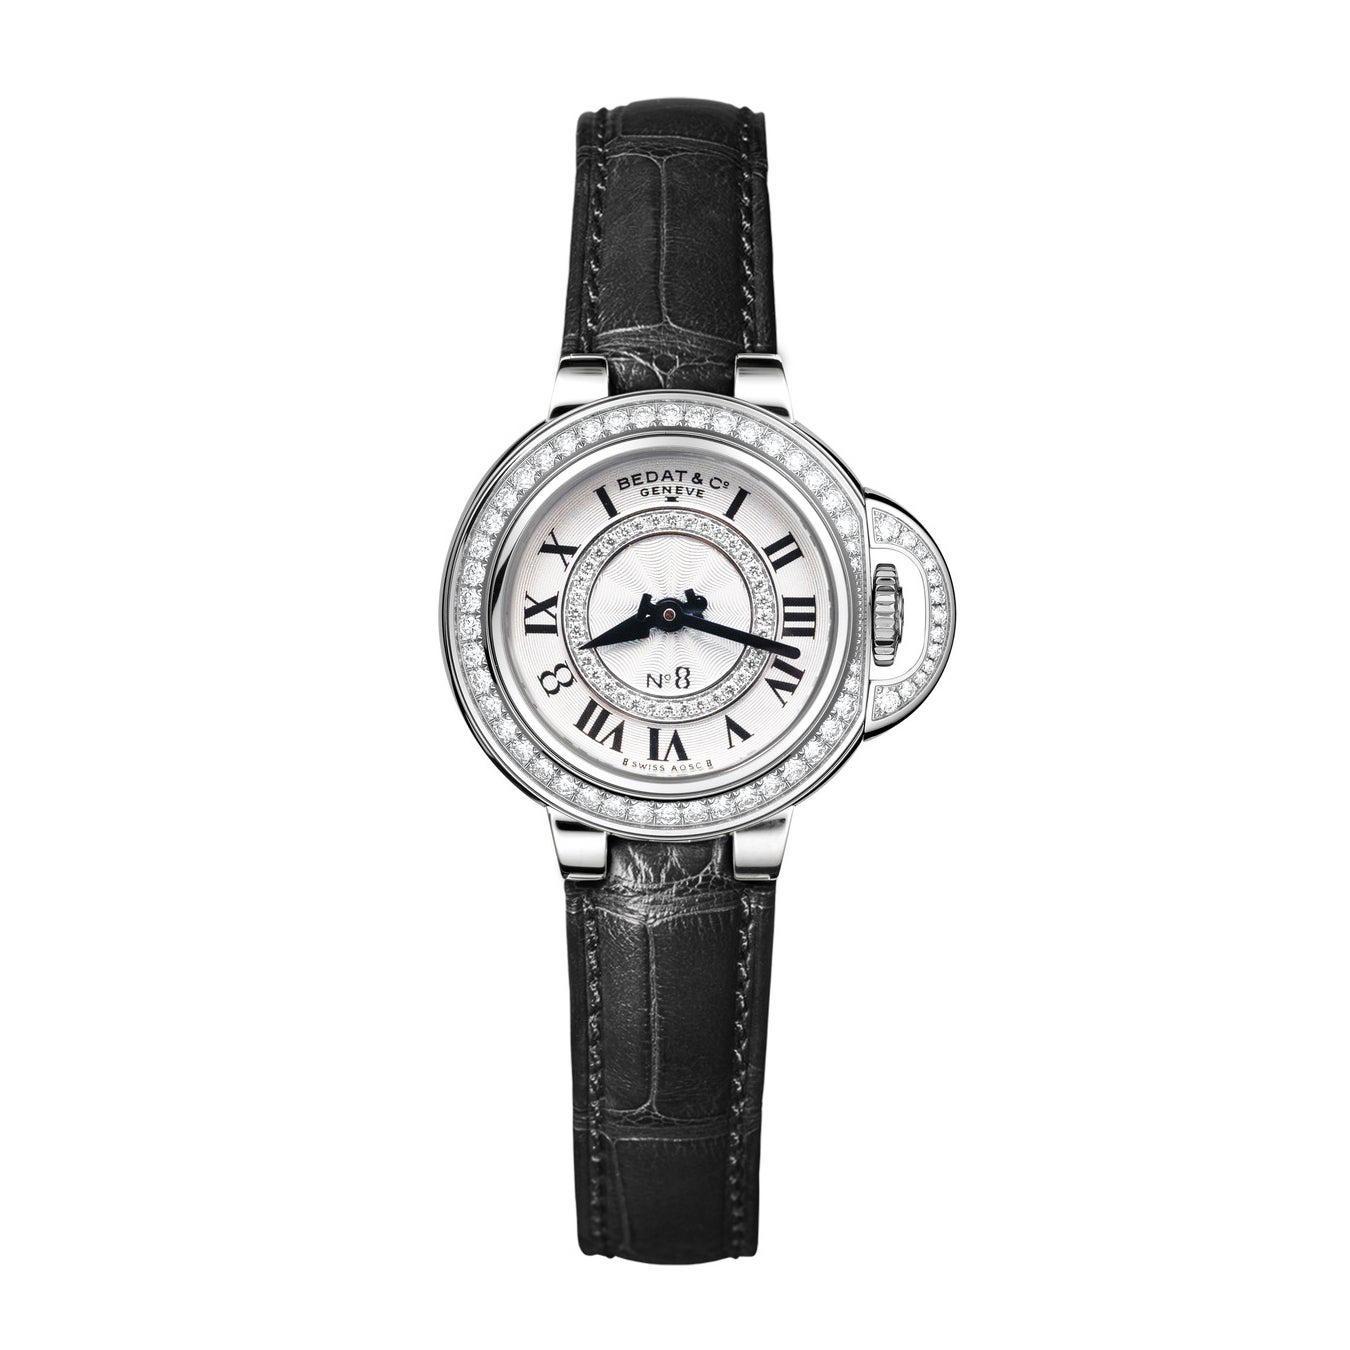 Bedat & Co. Geneve Ladies Watch No. 8 Style#827040650